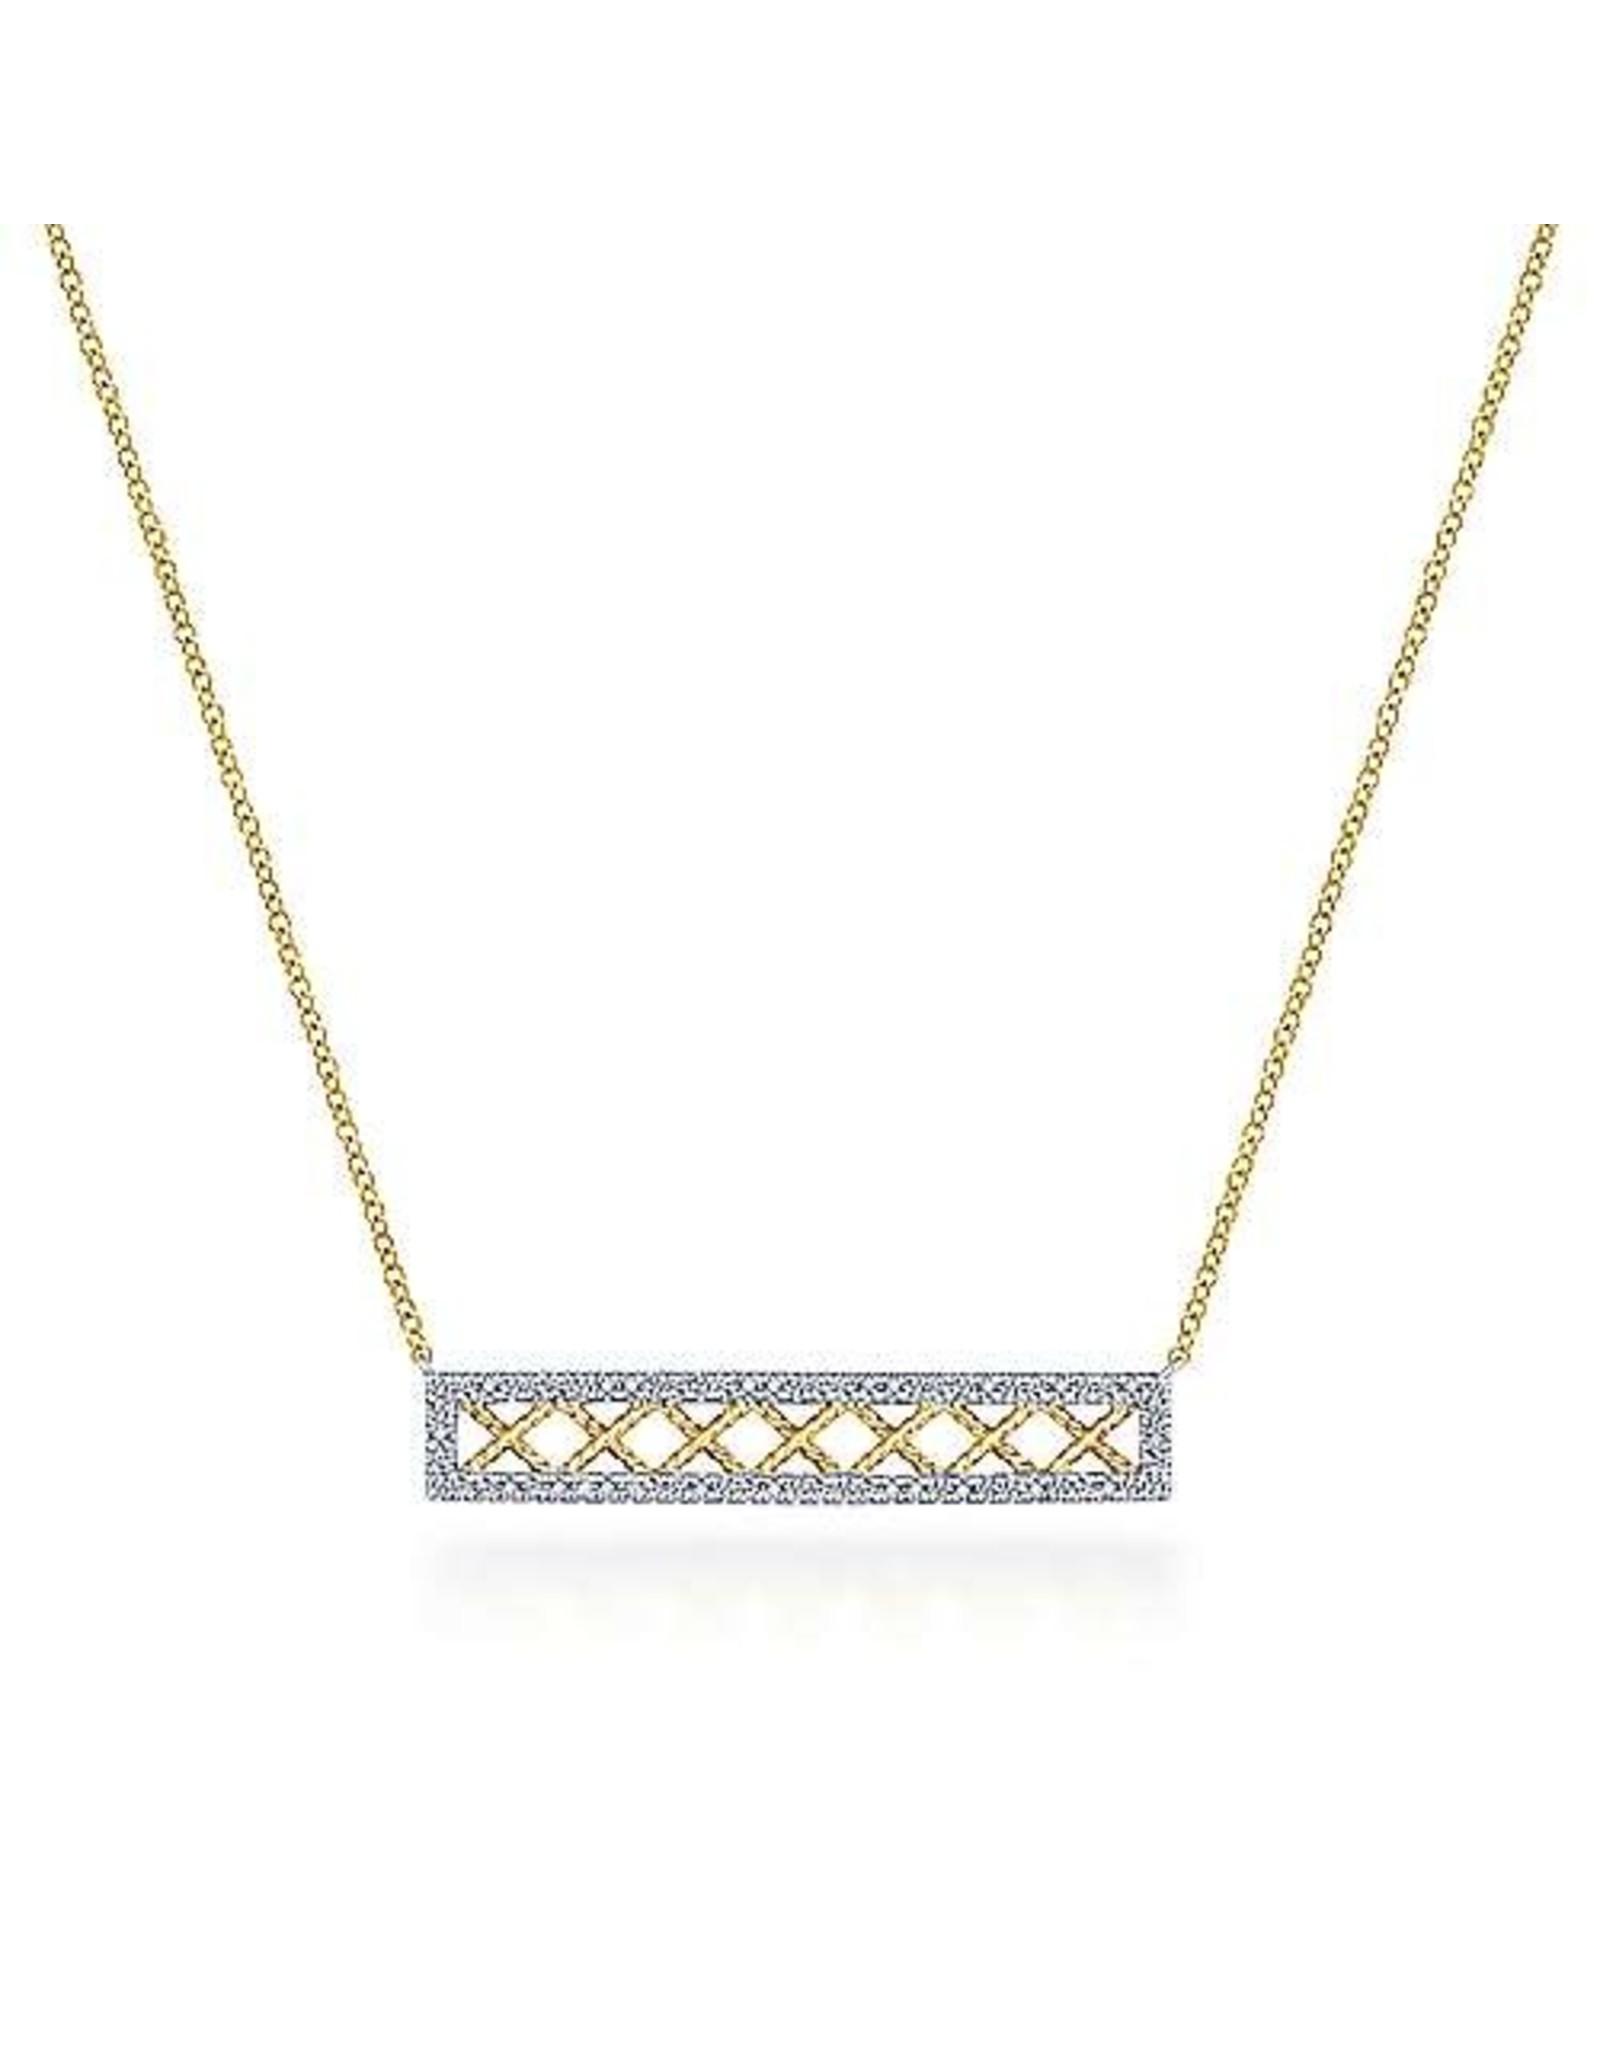 14K 2-Tone Openwork Diamond Bar Necklace, D: 0.32ct